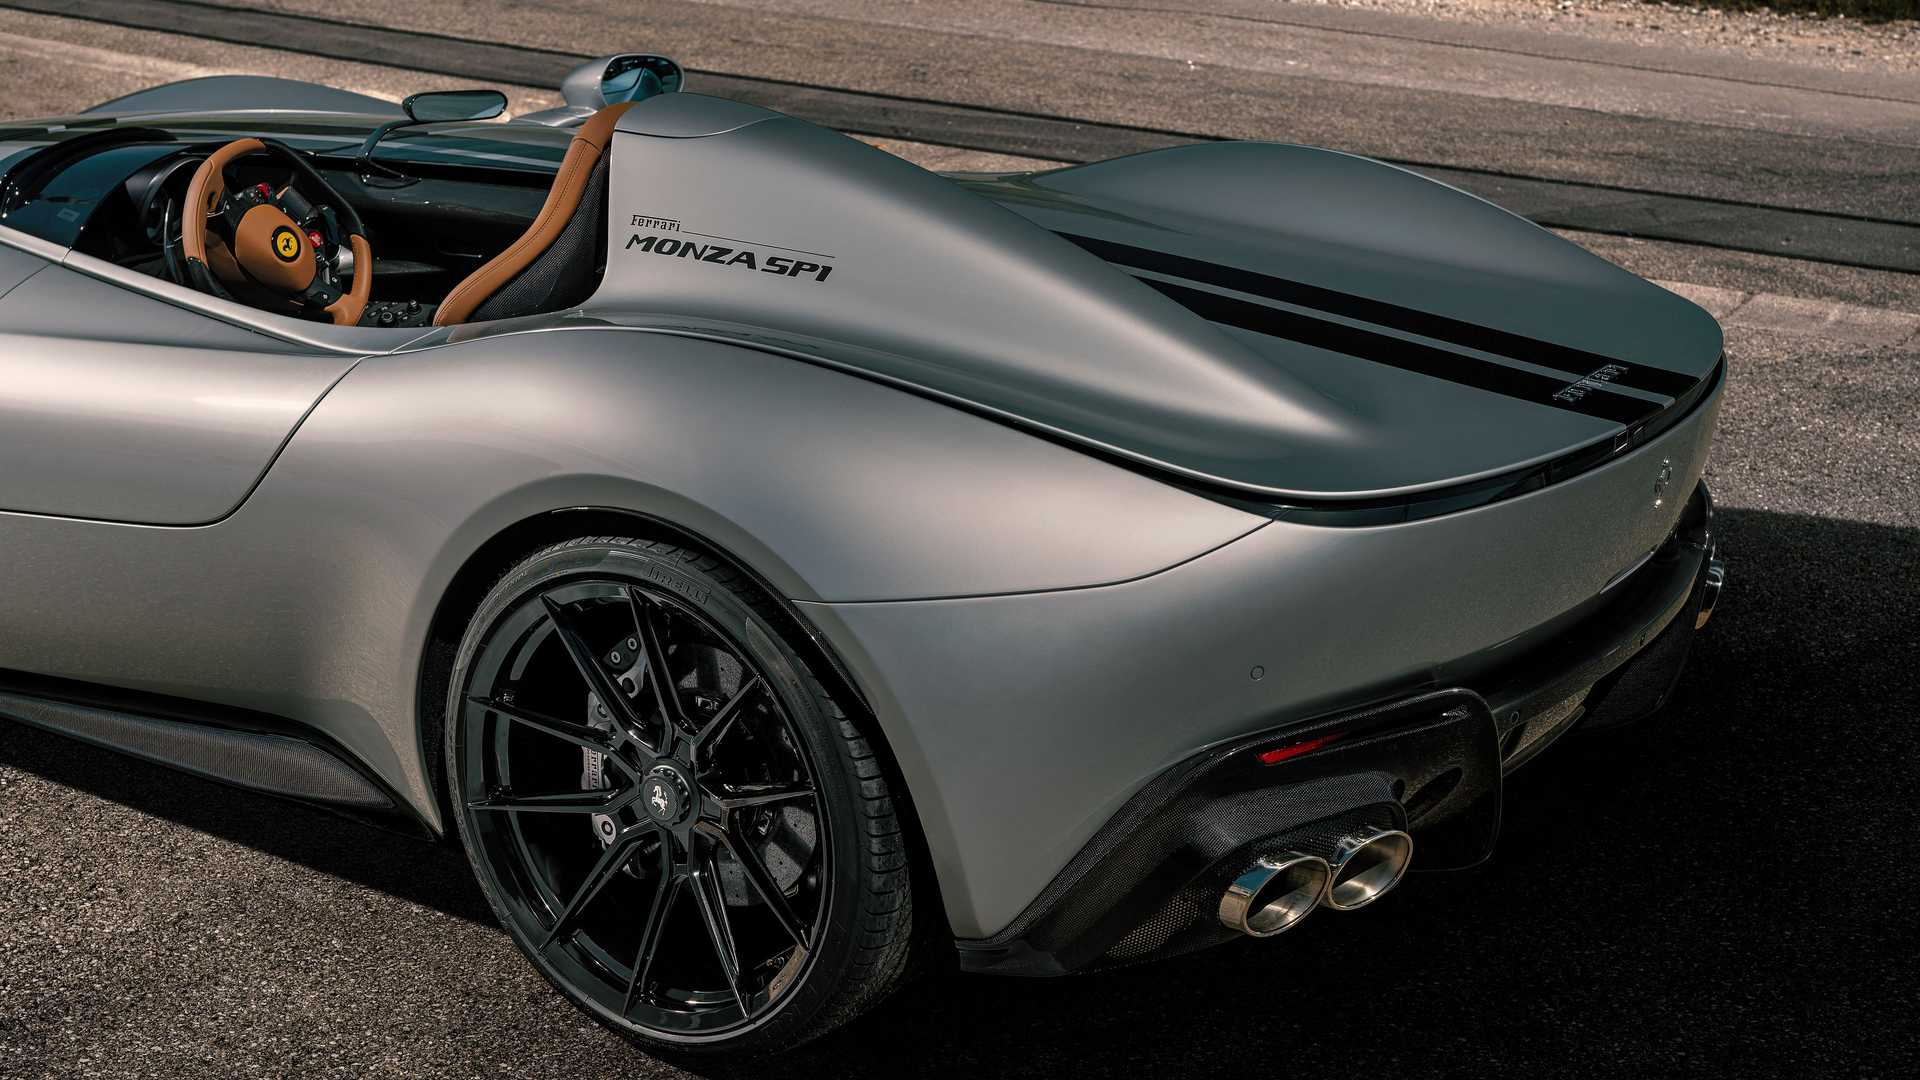 Ferrari_Monza_SP1_tuning_by_Novitec_0007